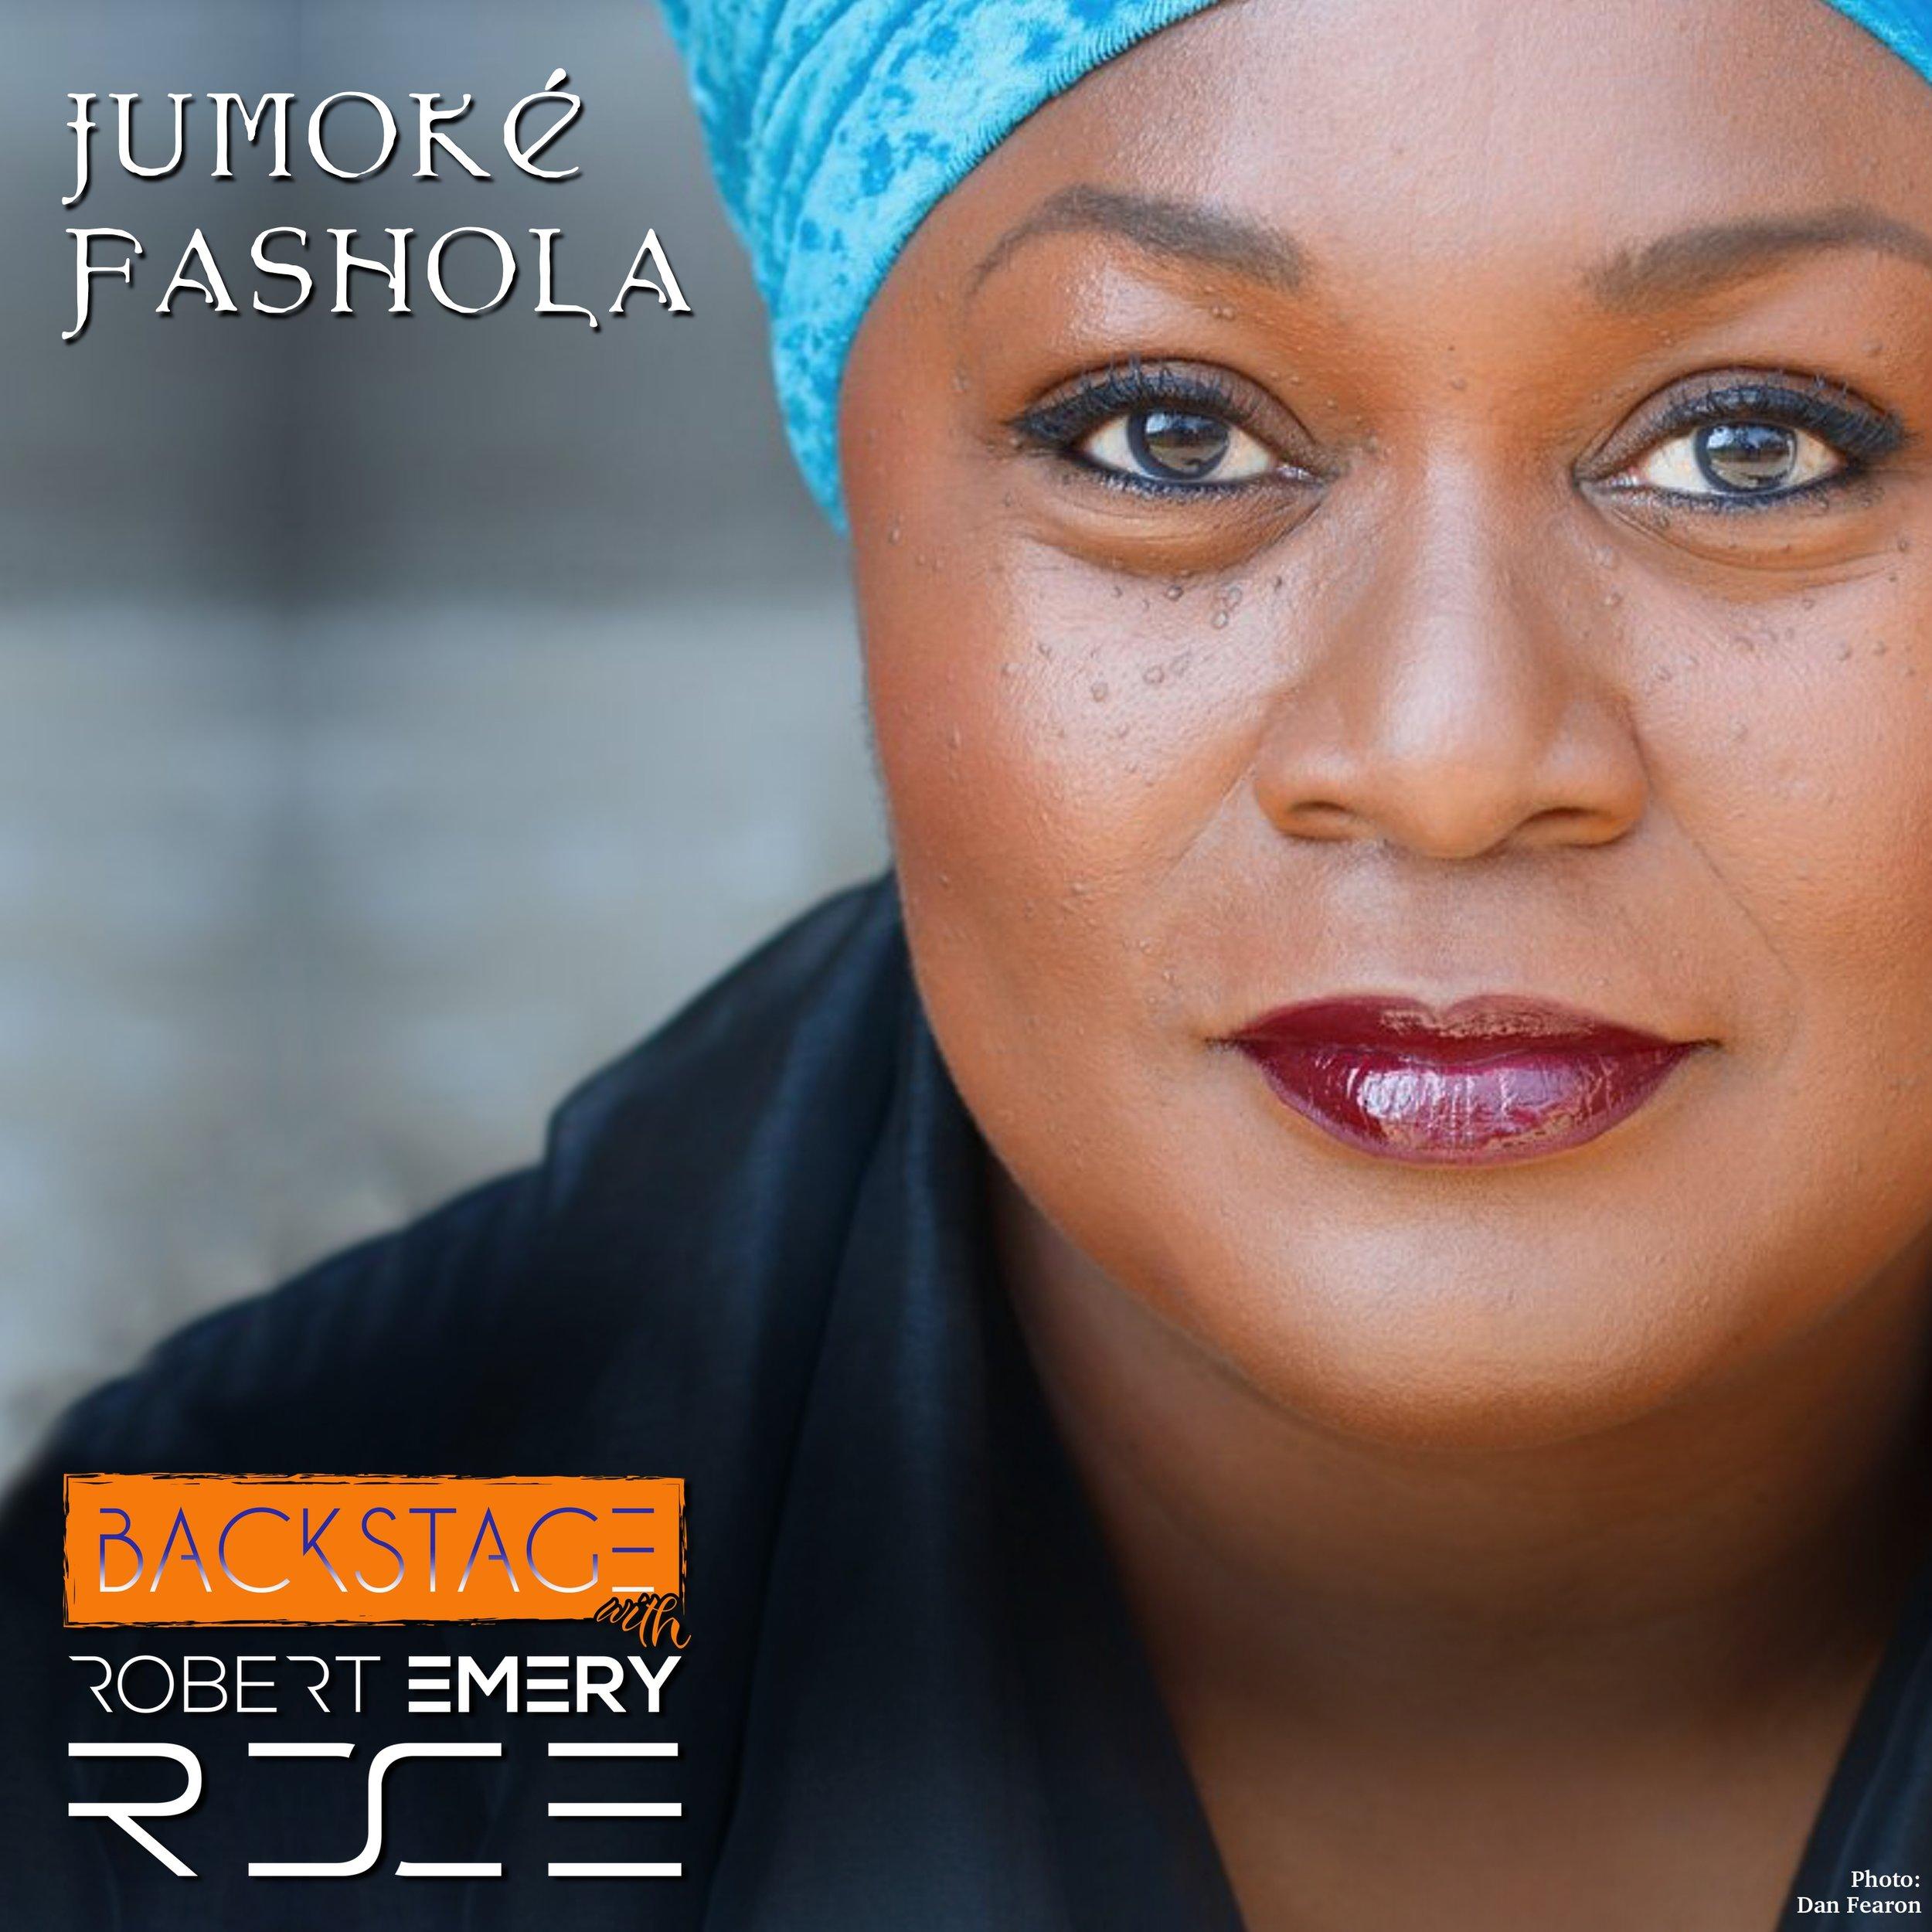 Jumoké Fashola (Photo: Dan Fearon)